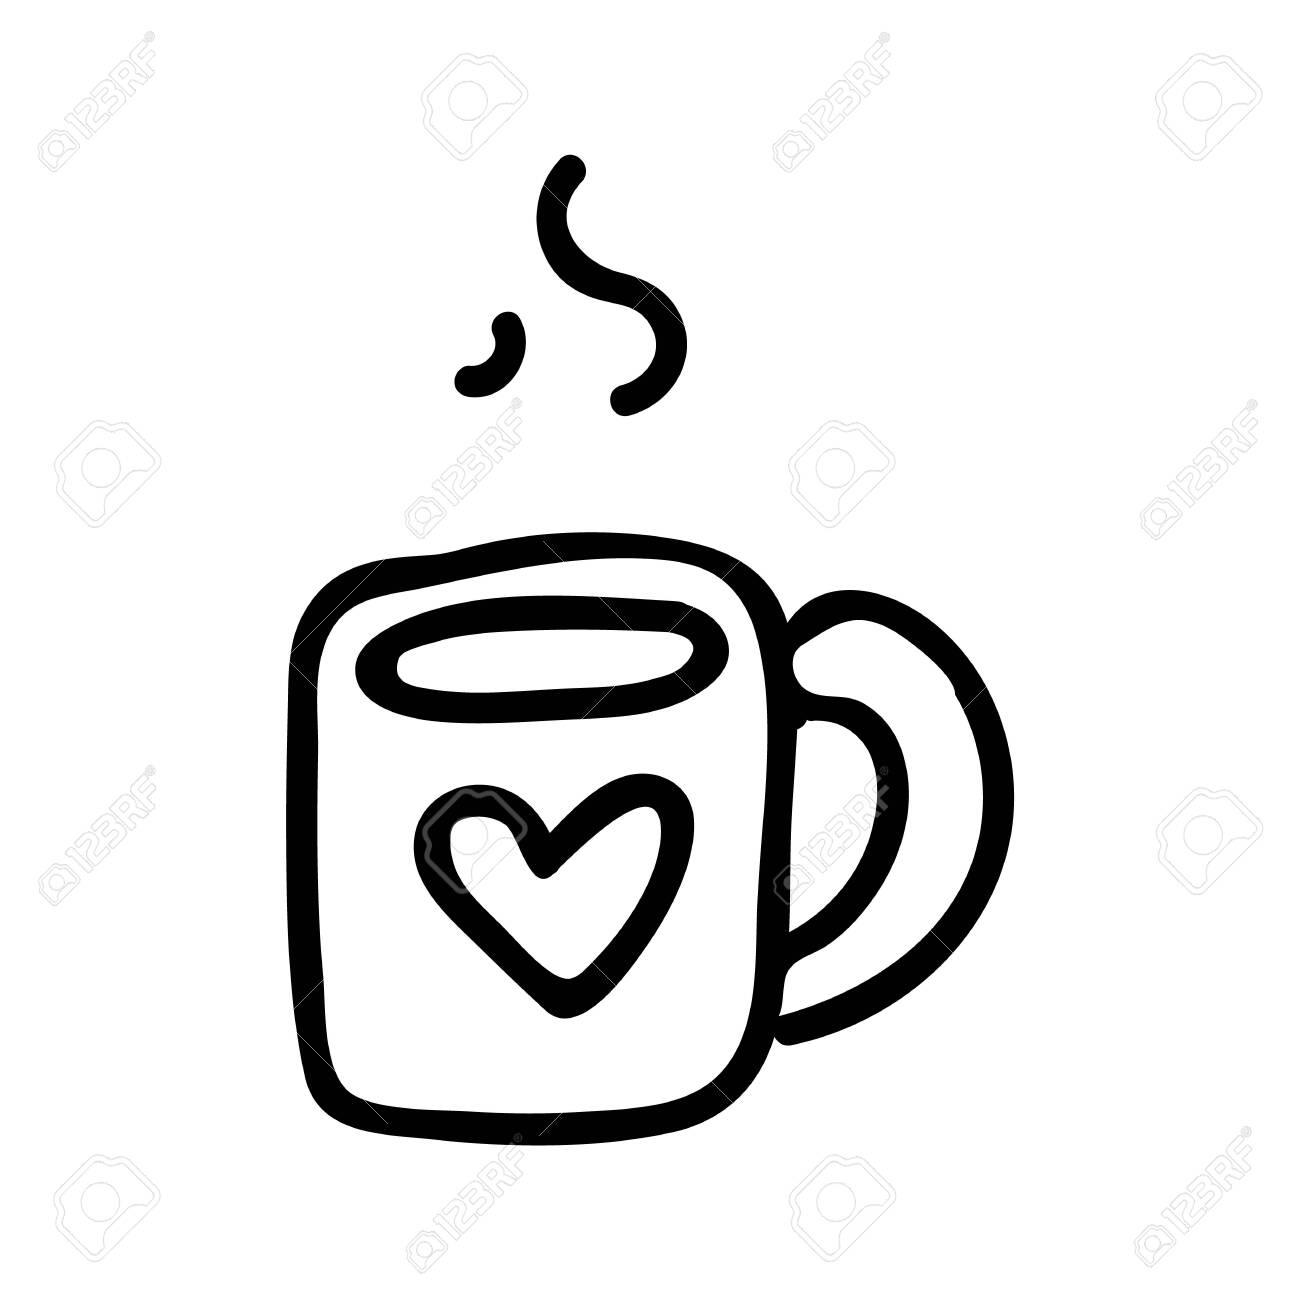 Cute Tea Mug Lineart Cartoon Vector Illustration Hand Drawn Royalty Free Cliparts Vectors And Stock Illustration Image 144445508